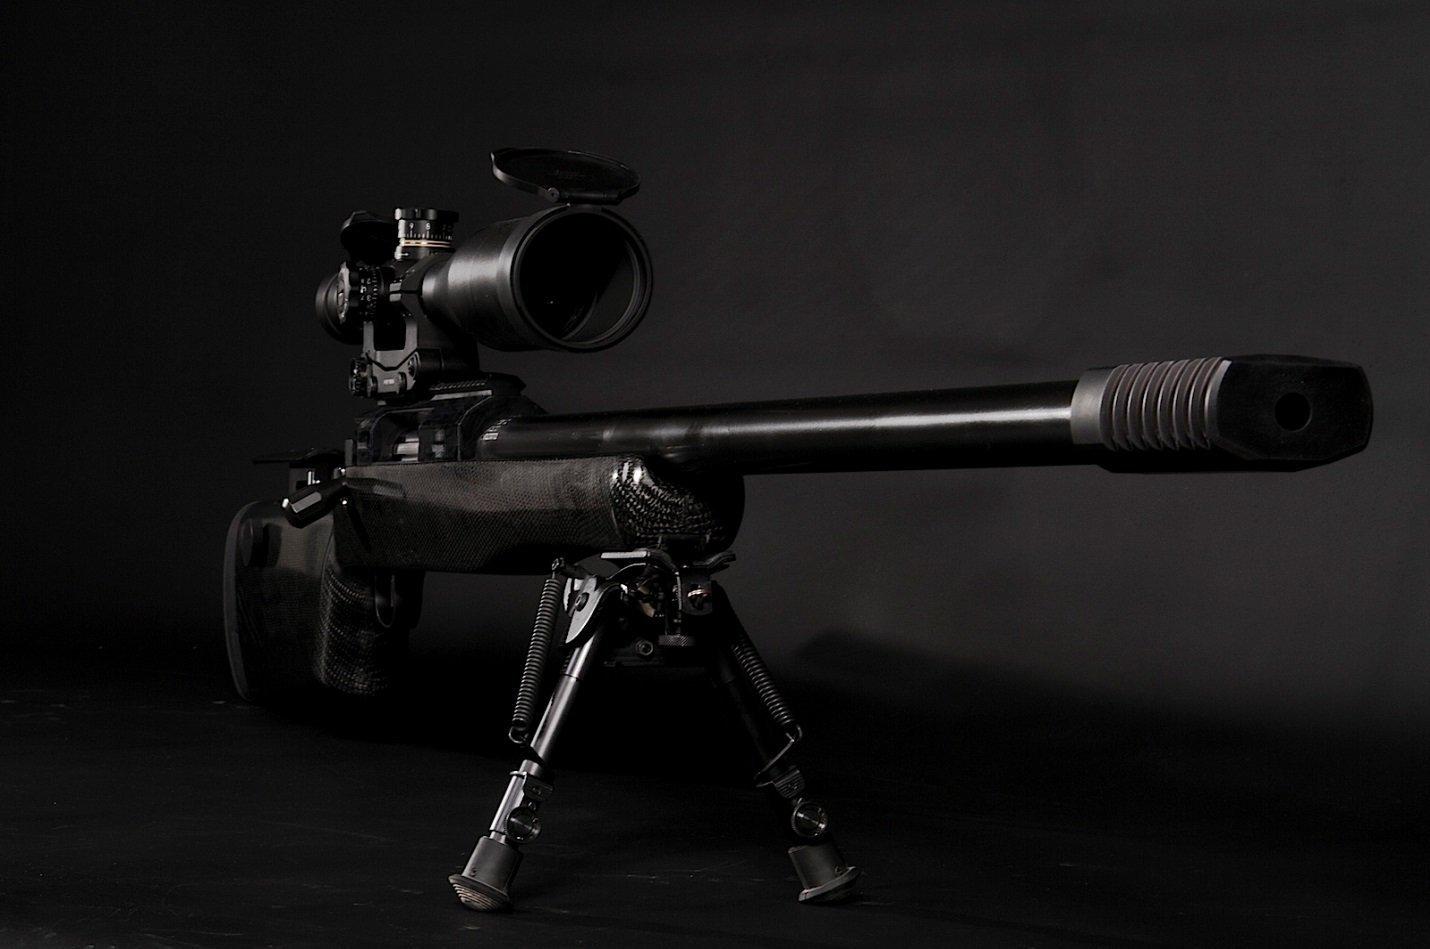 Un fusil de alta precisión Lobaev